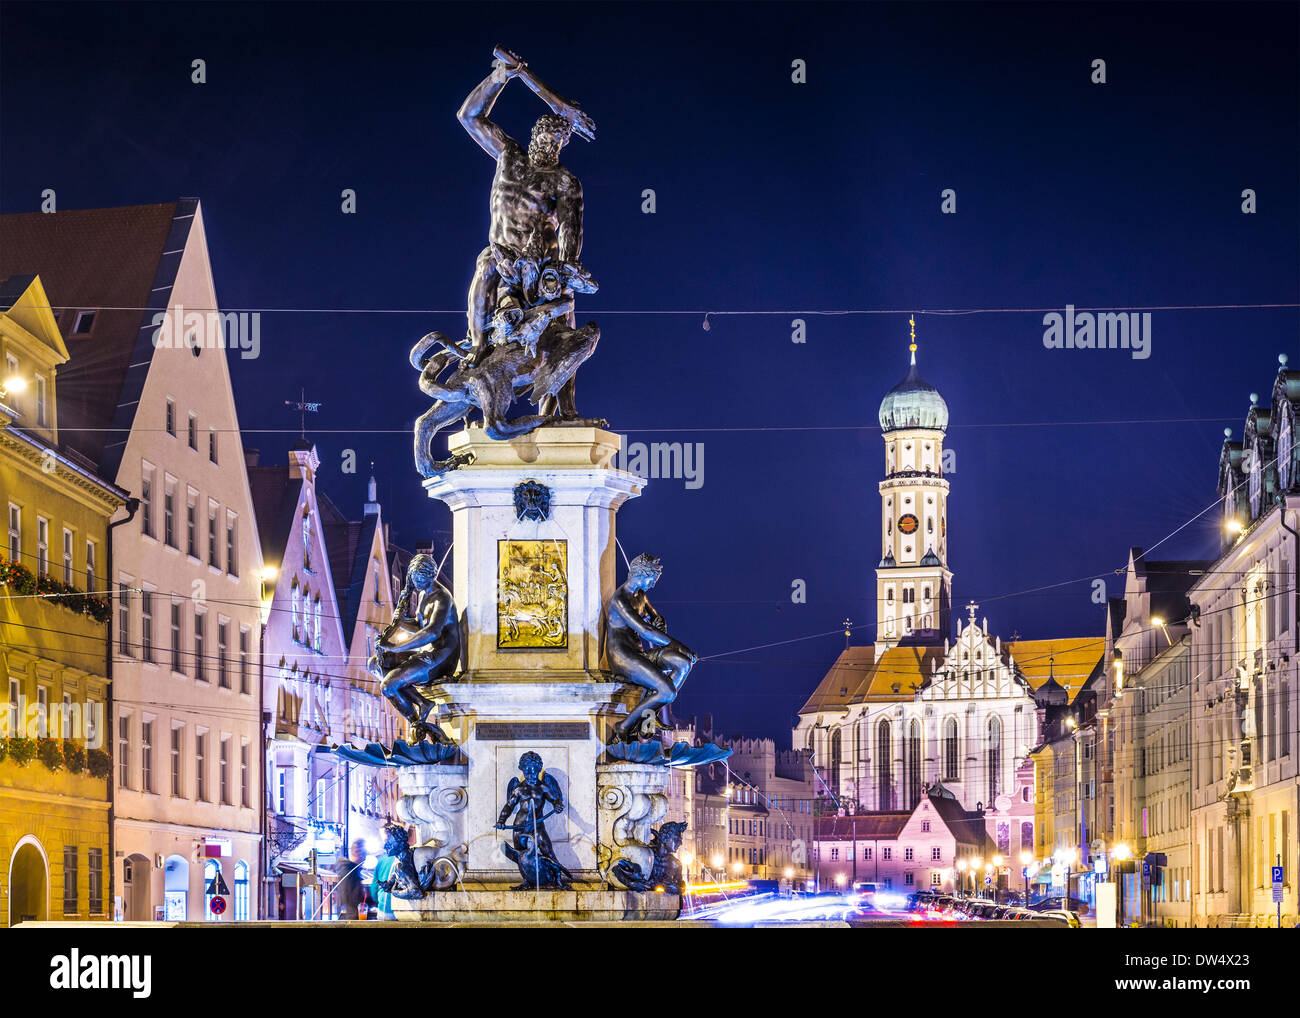 Augsburg, Germany townscape on Maximilianstrasse. - Stock Image